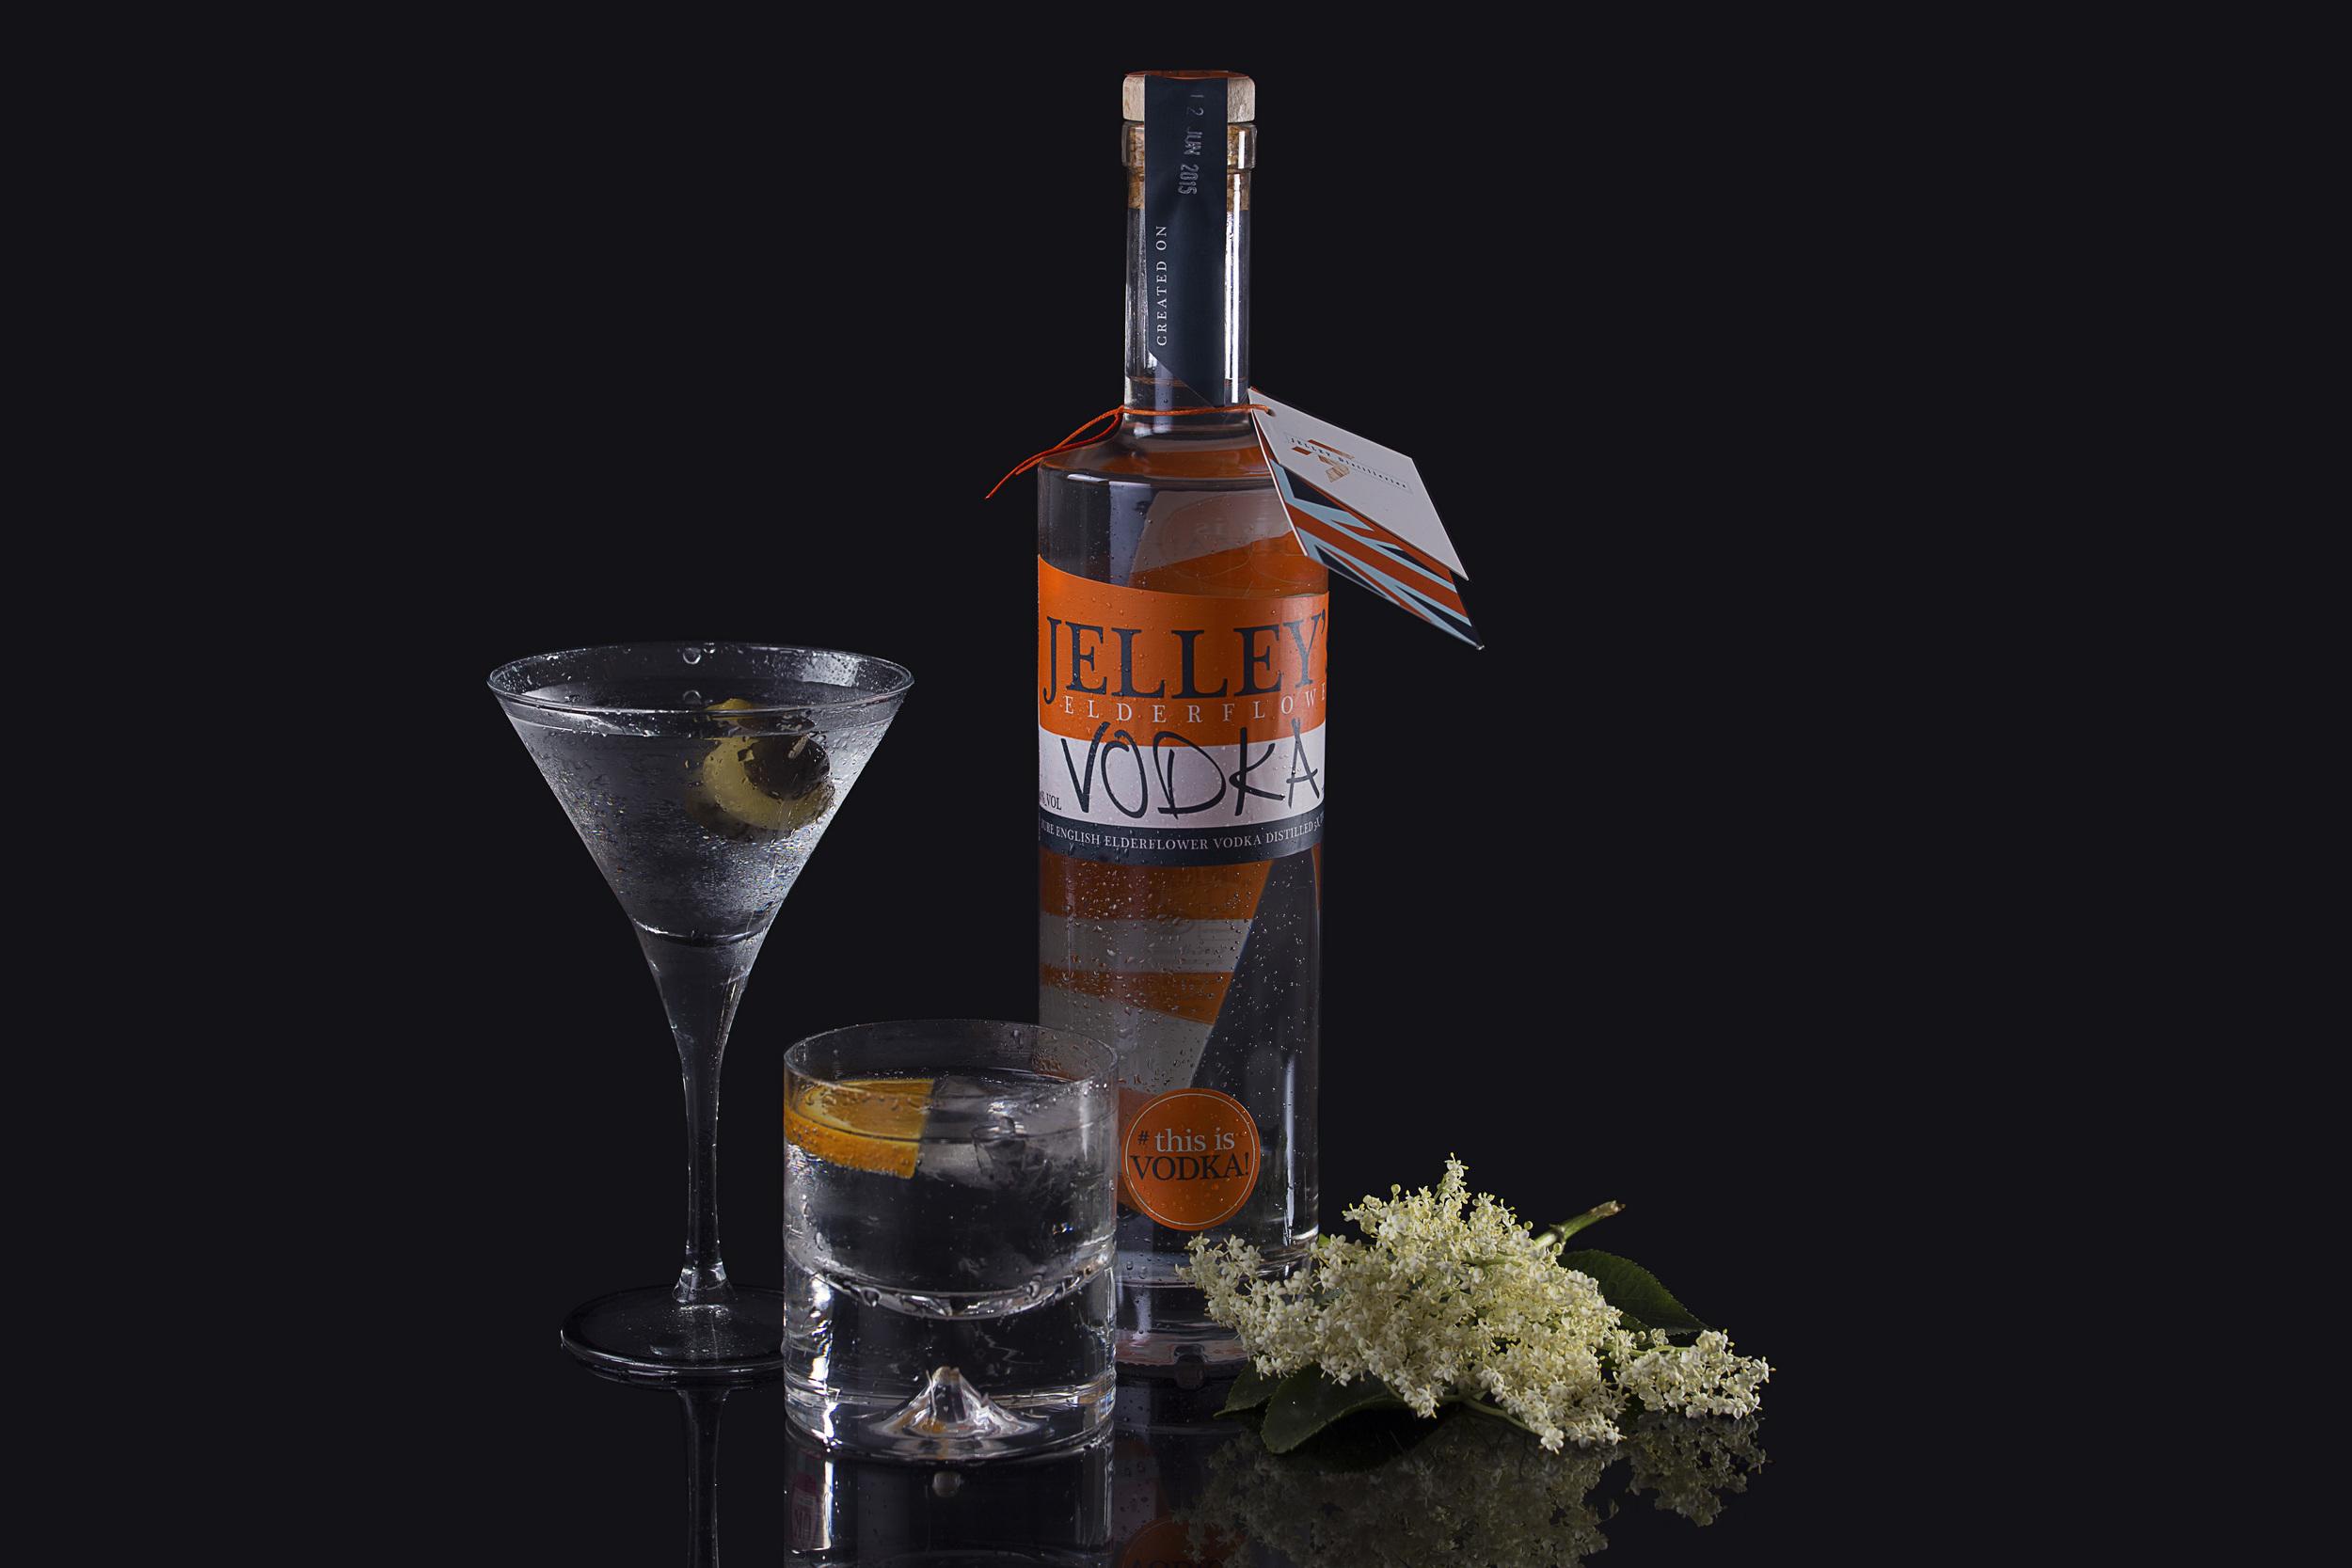 Jelley's Vodka